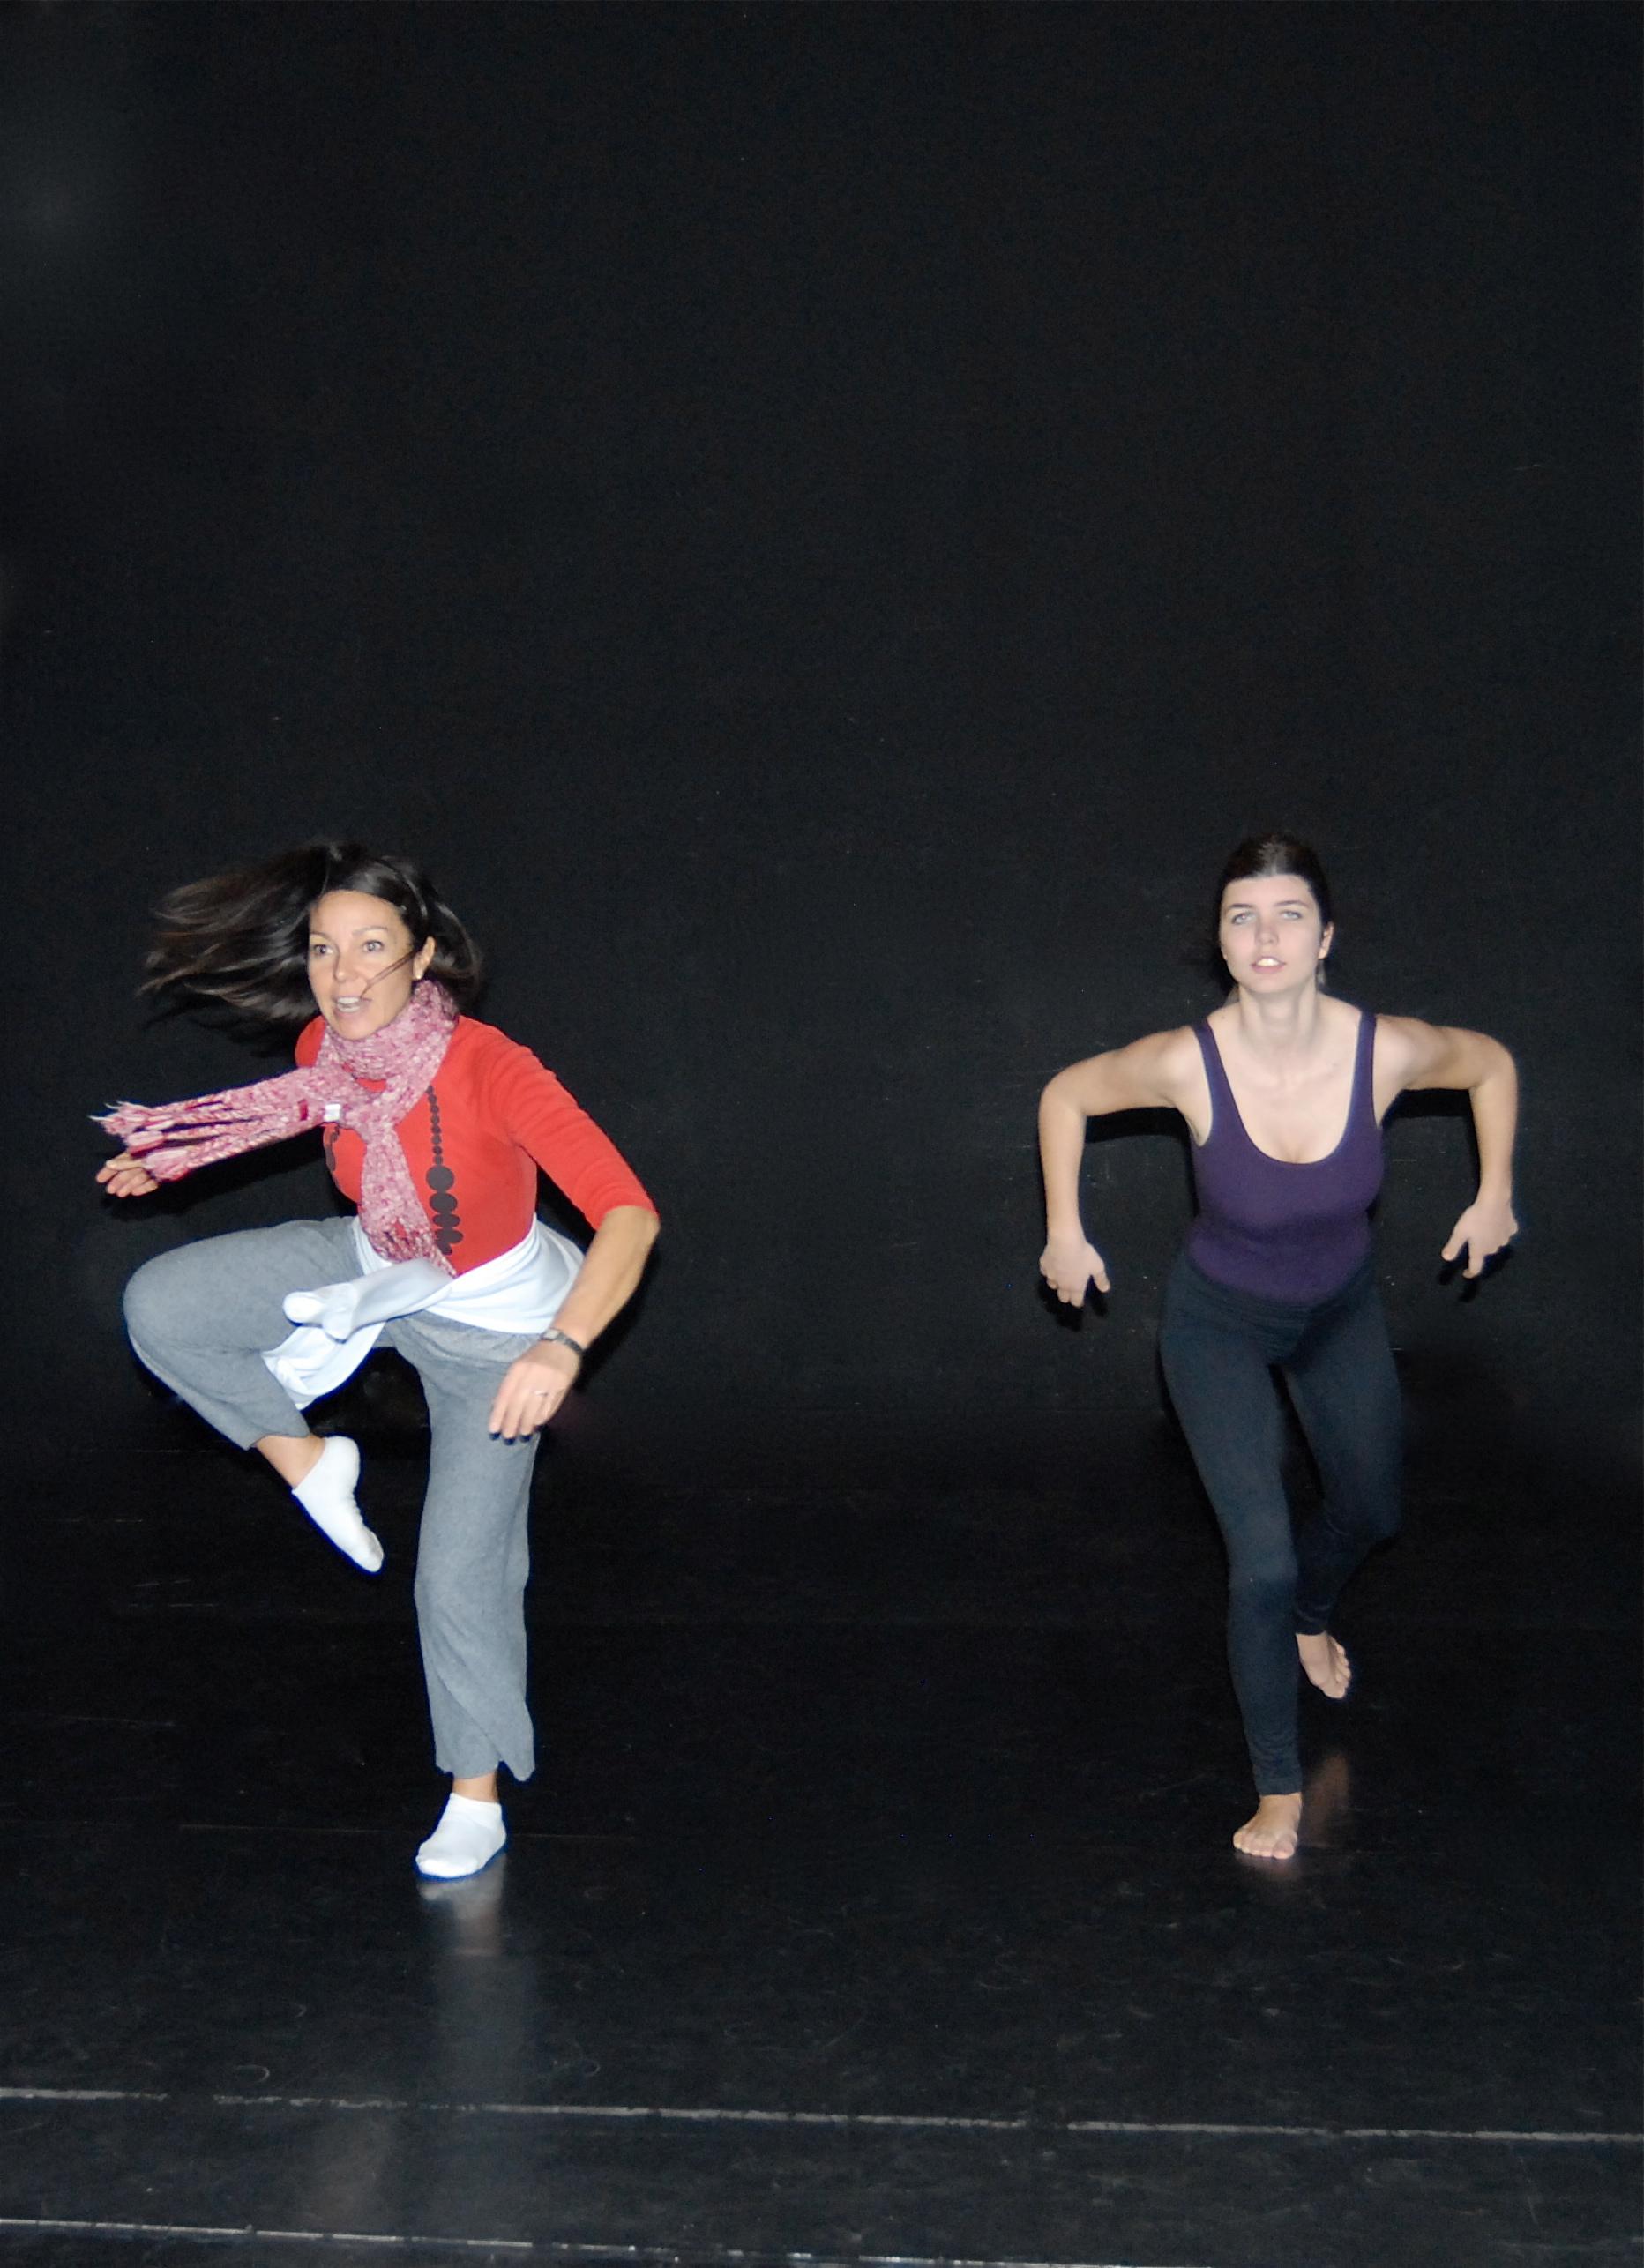 danse-disciplines